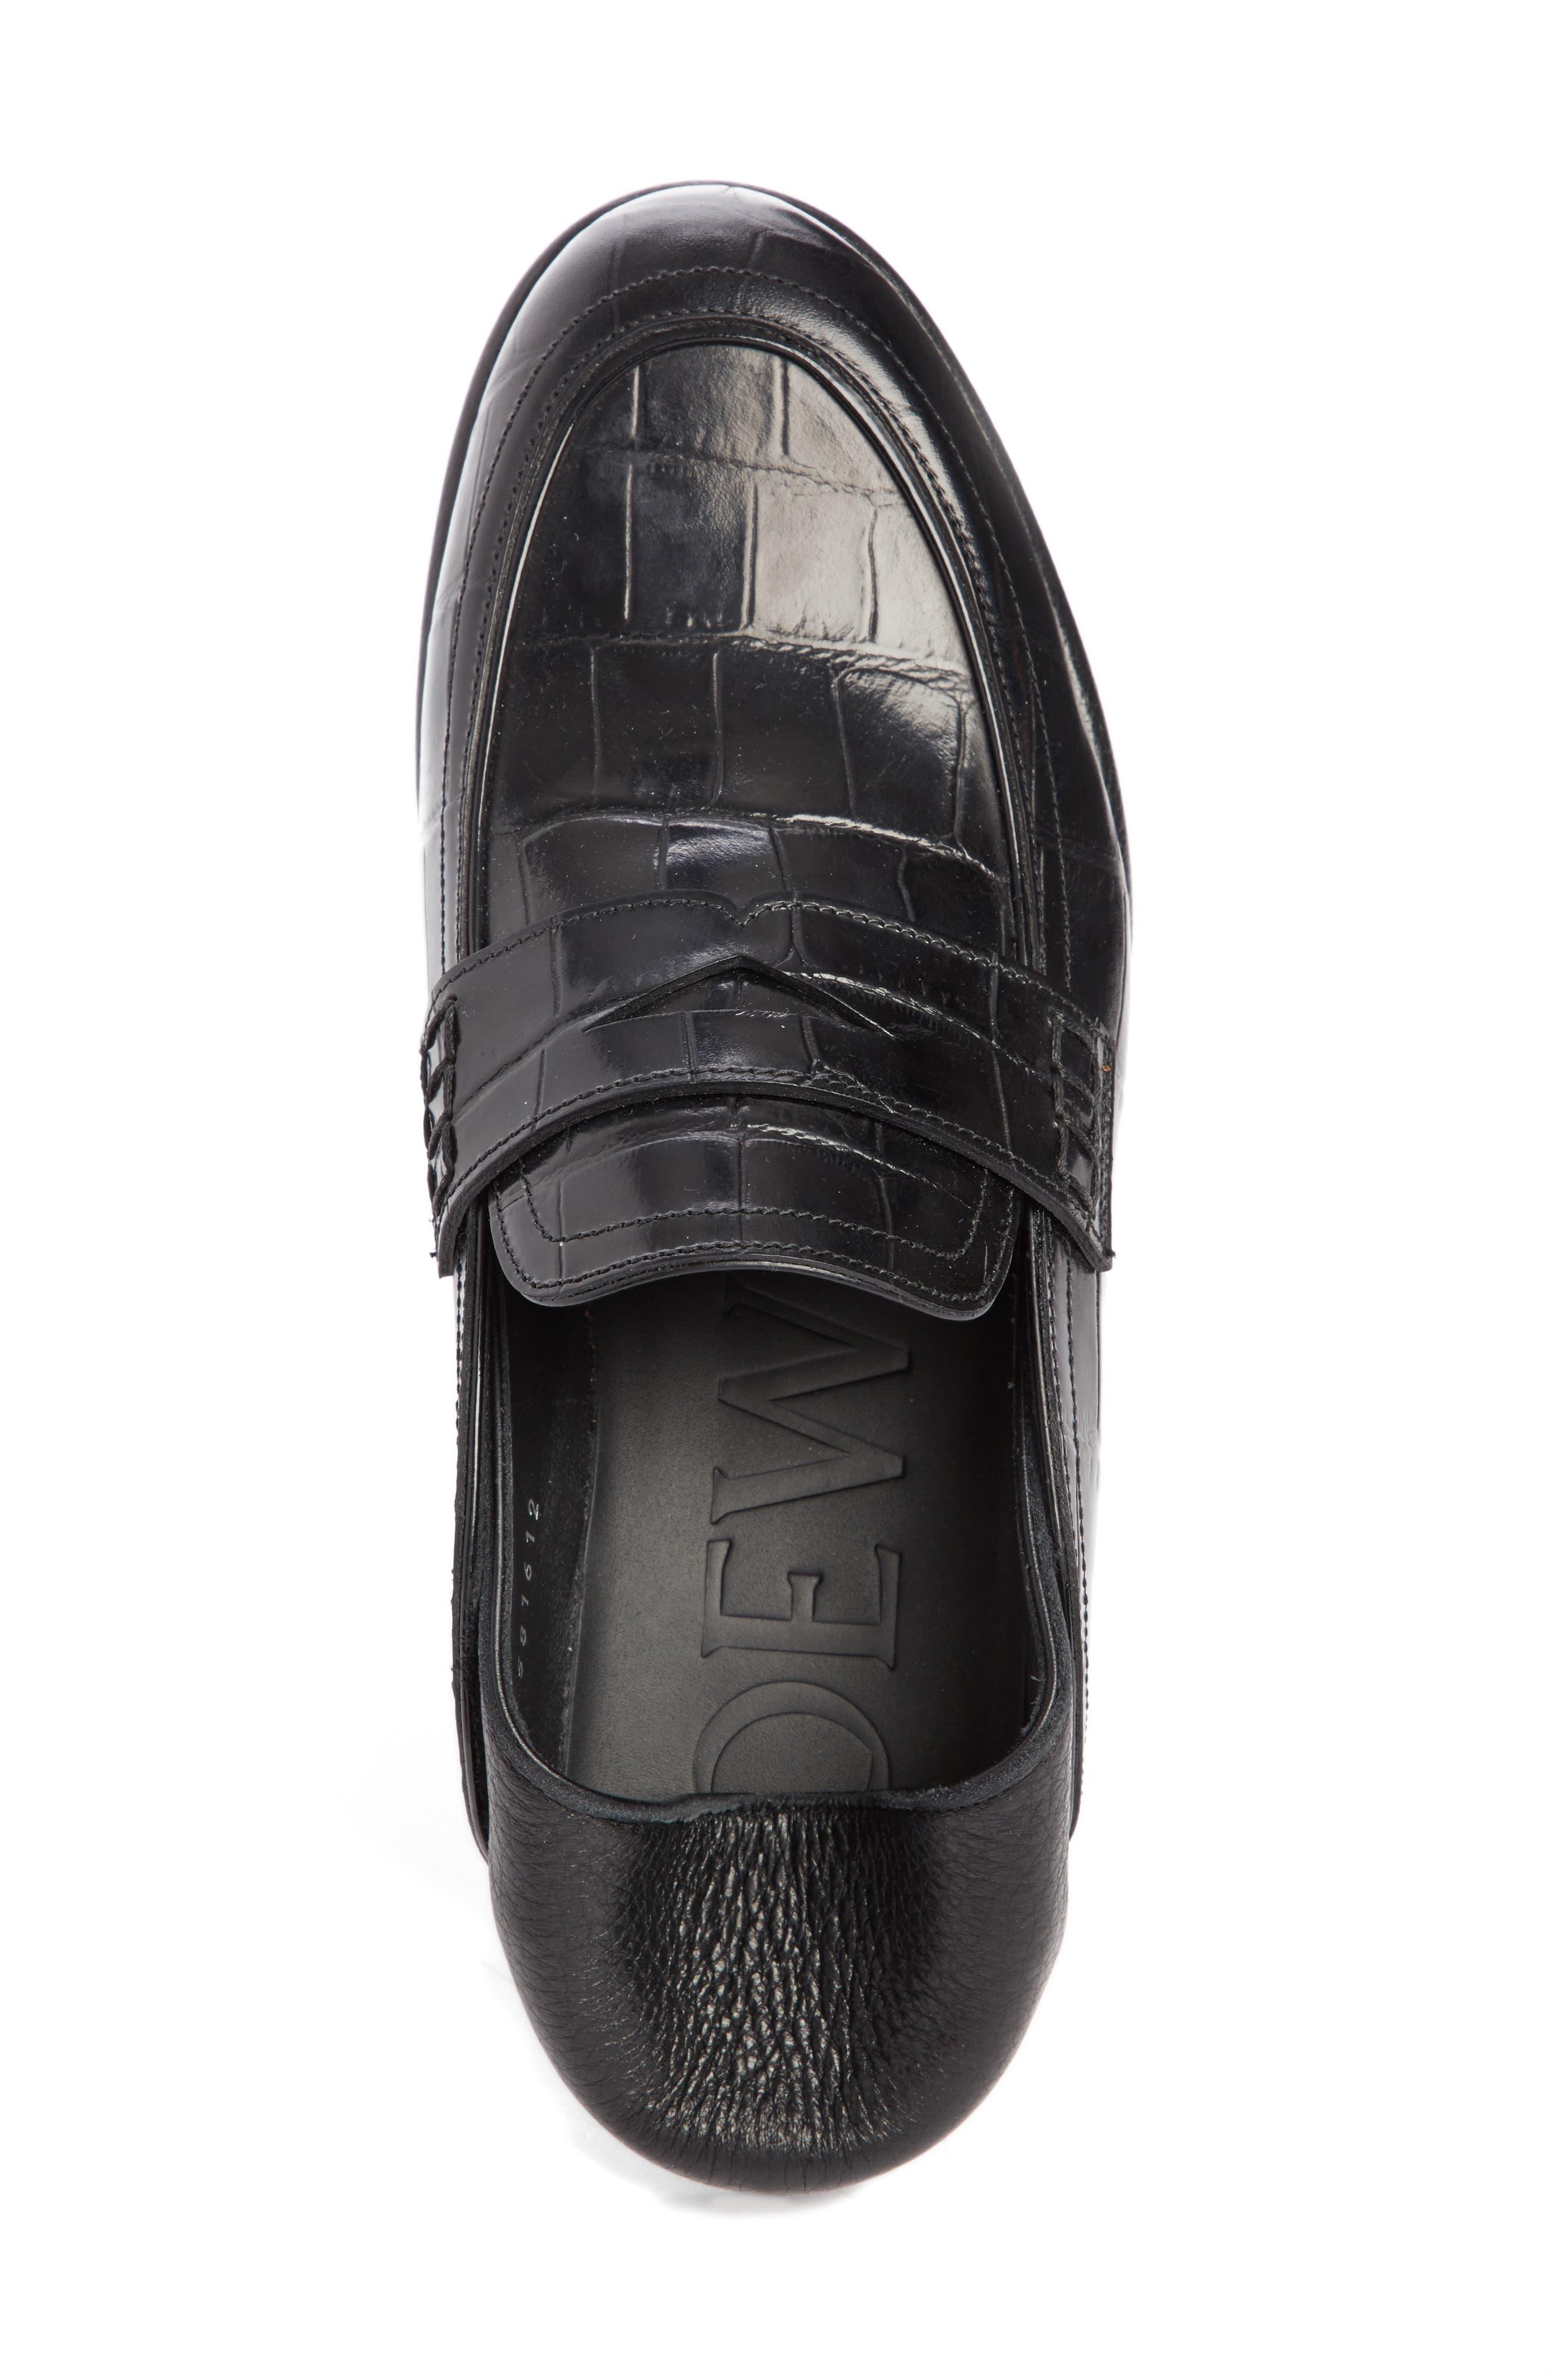 Croc Embossed Convertible Loafer,                             Alternate thumbnail 5, color,                             Black